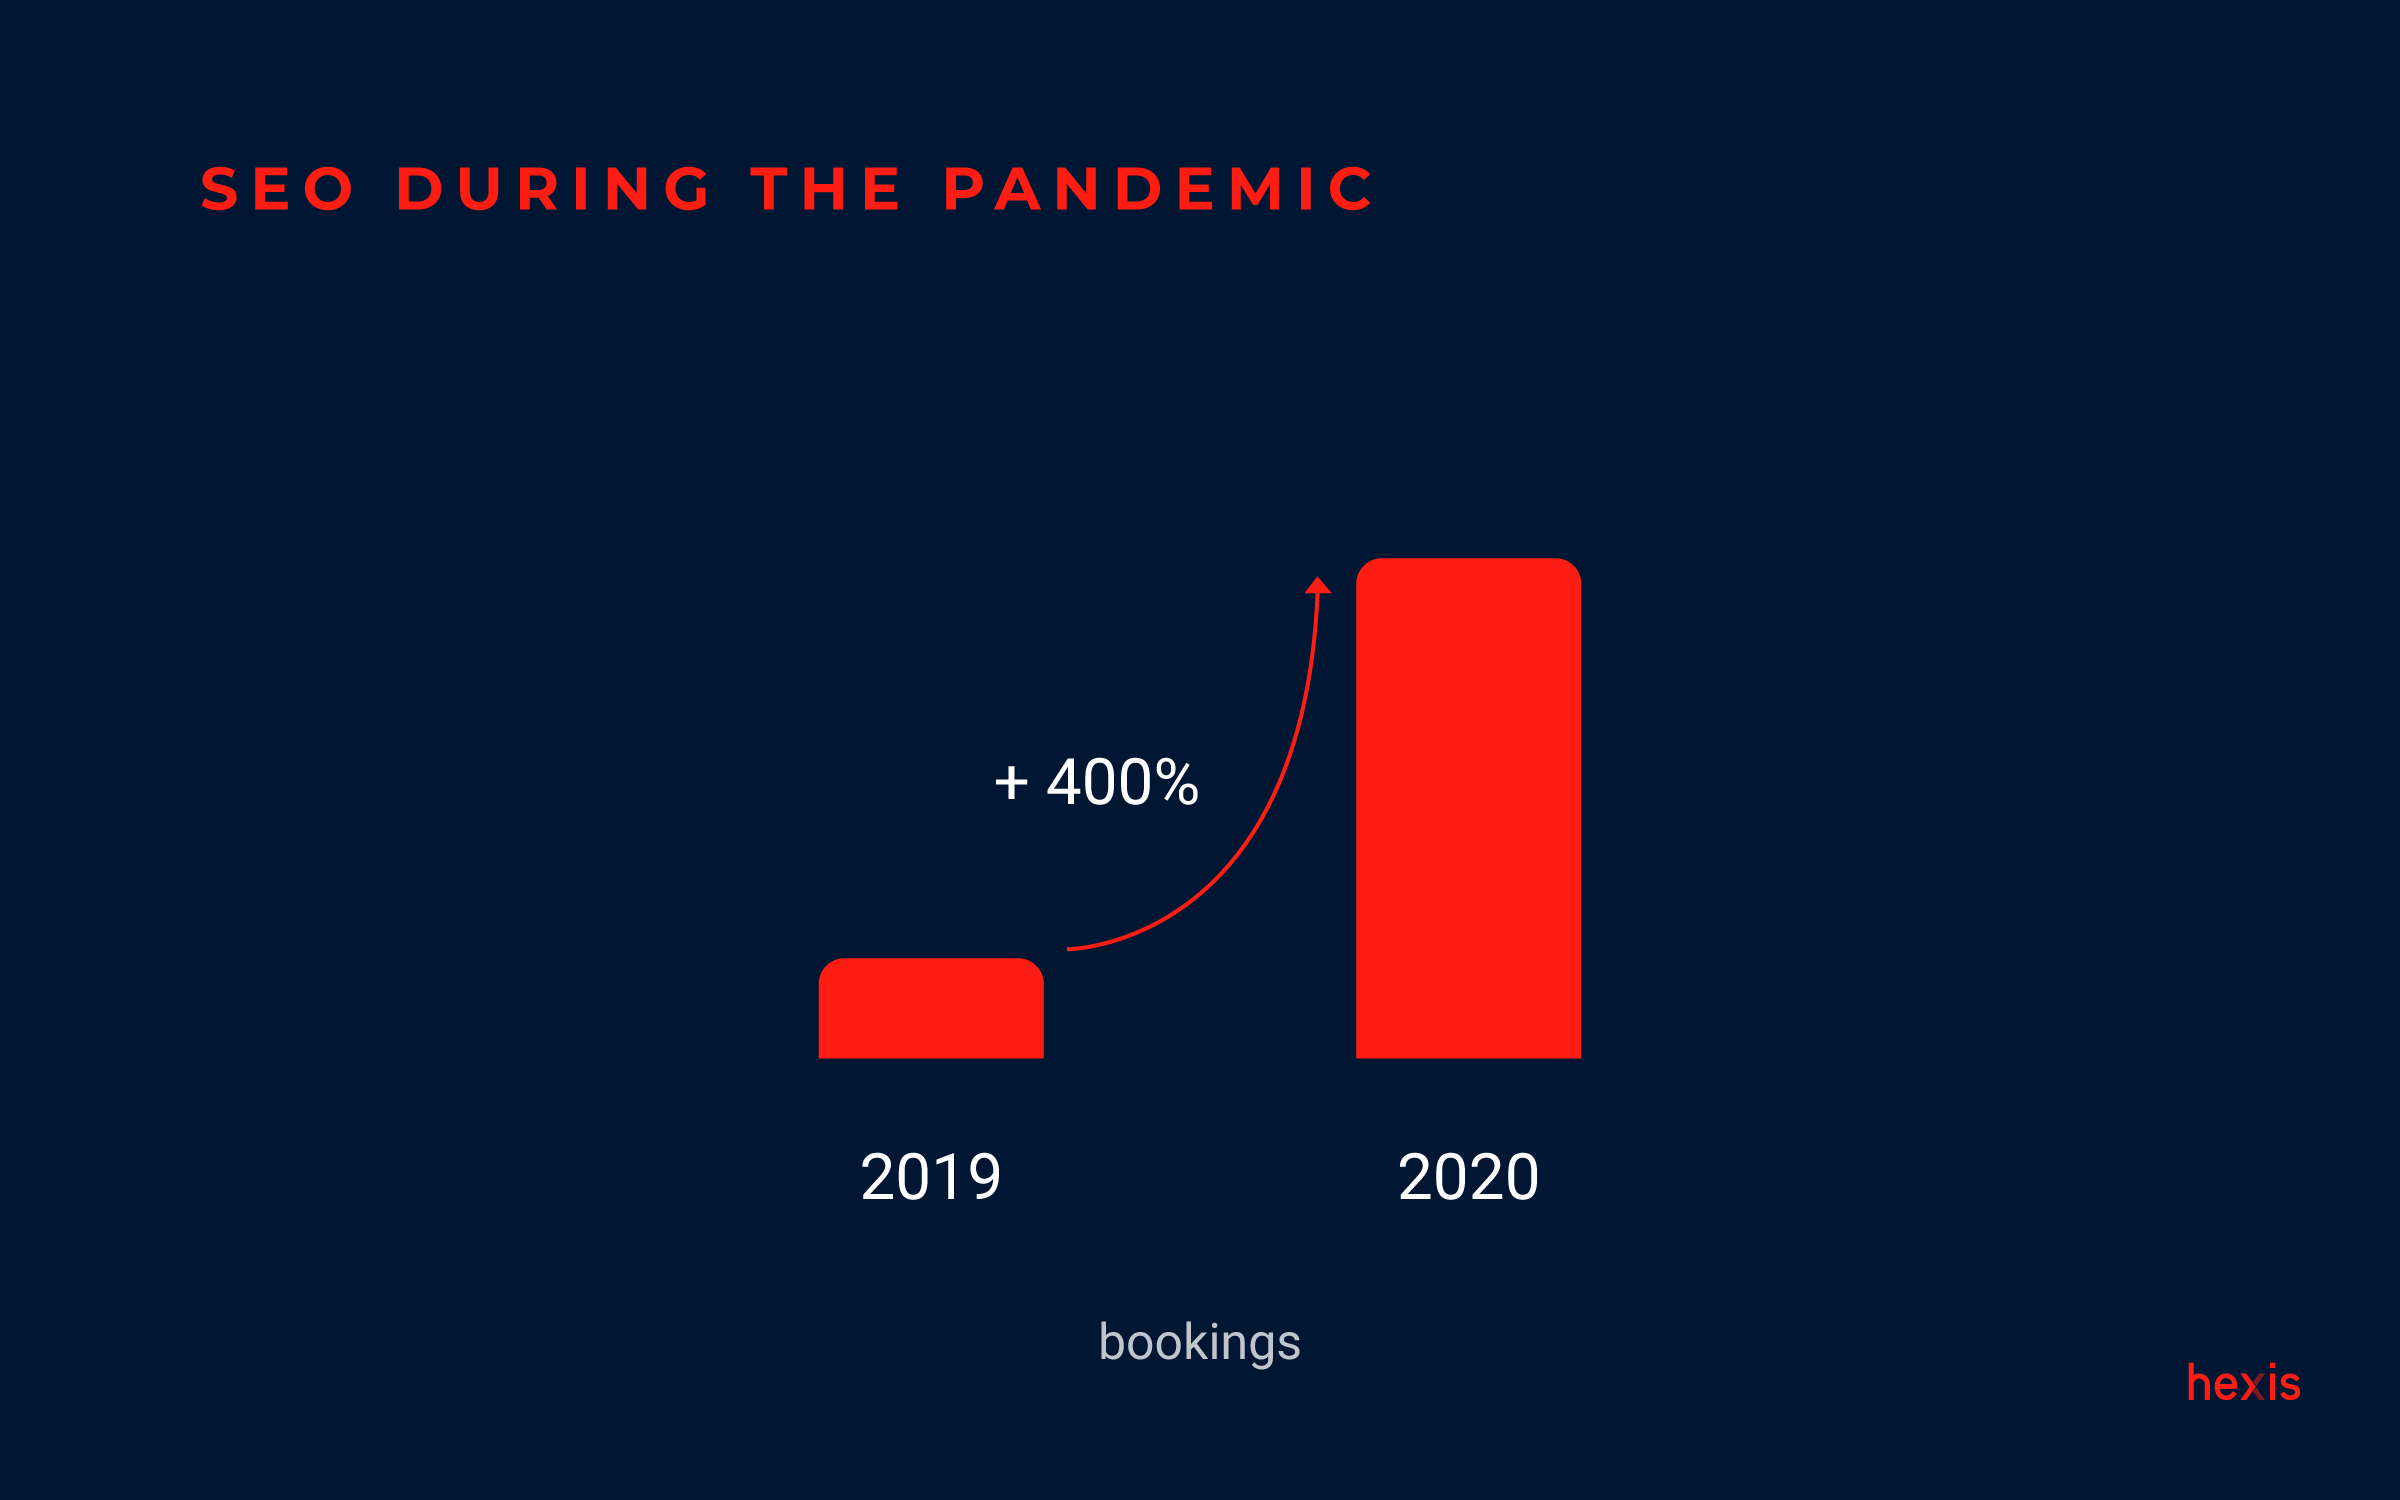 seo during pandemic